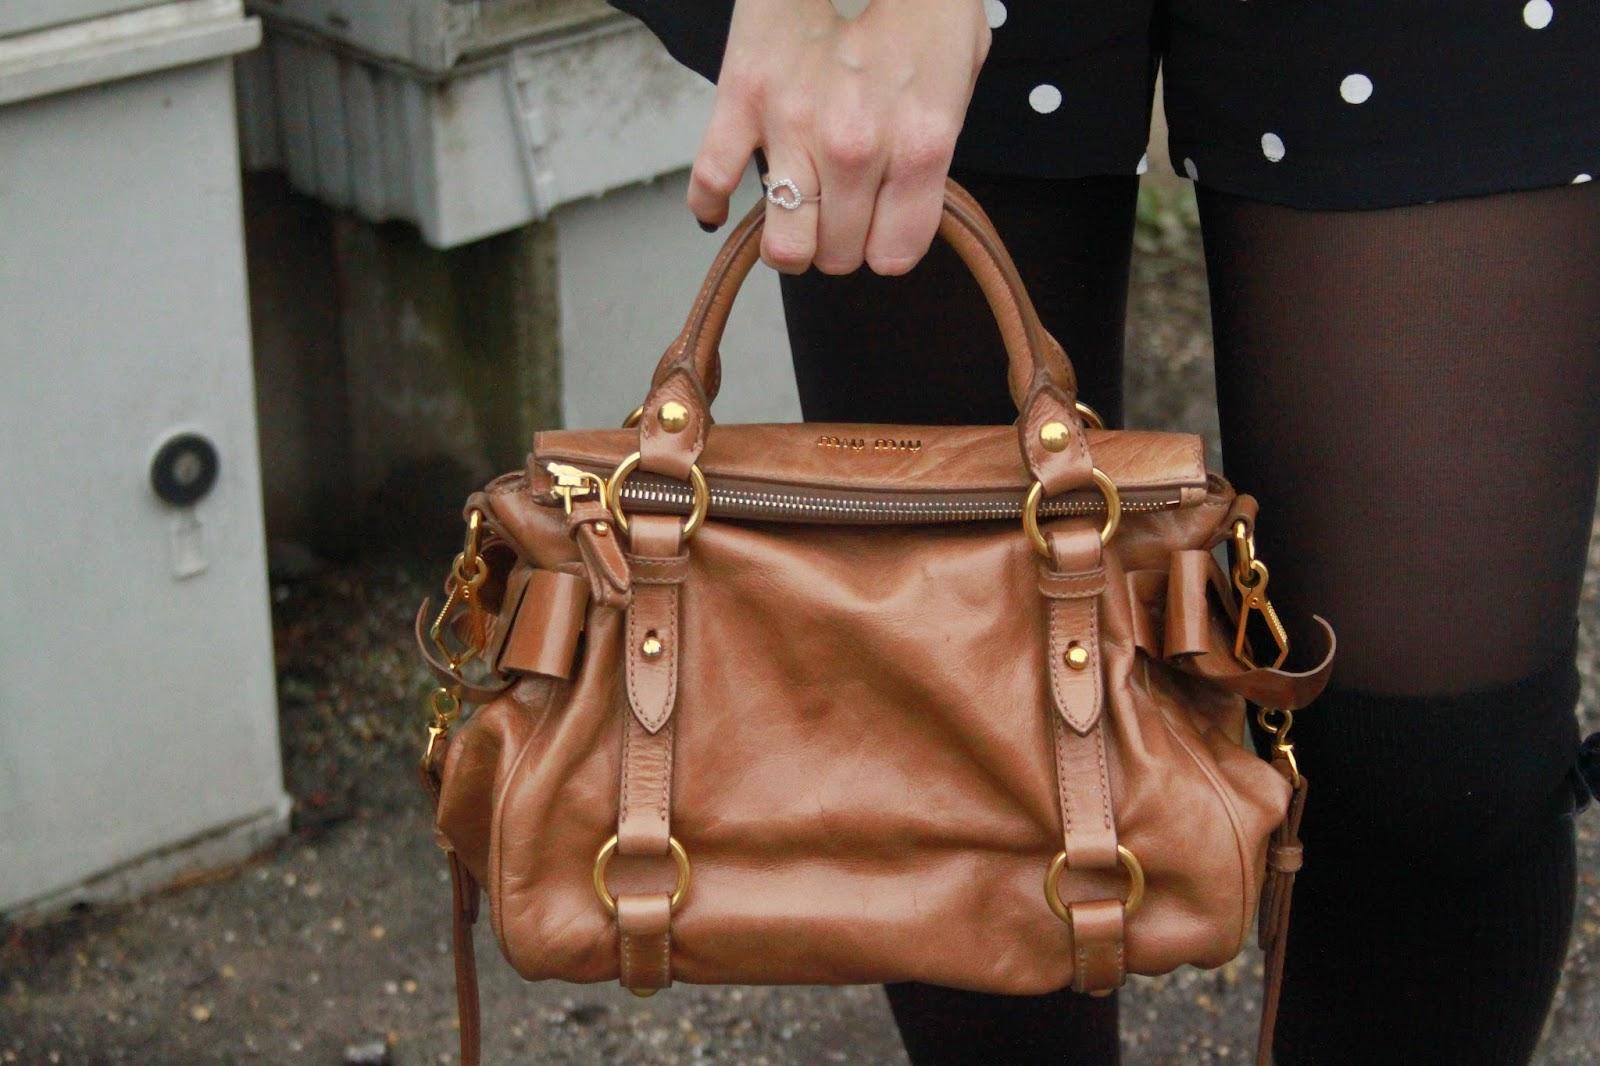 f7e5c10bfc37 My new Miu Miu Bow Bag!! – Silvia Arossa